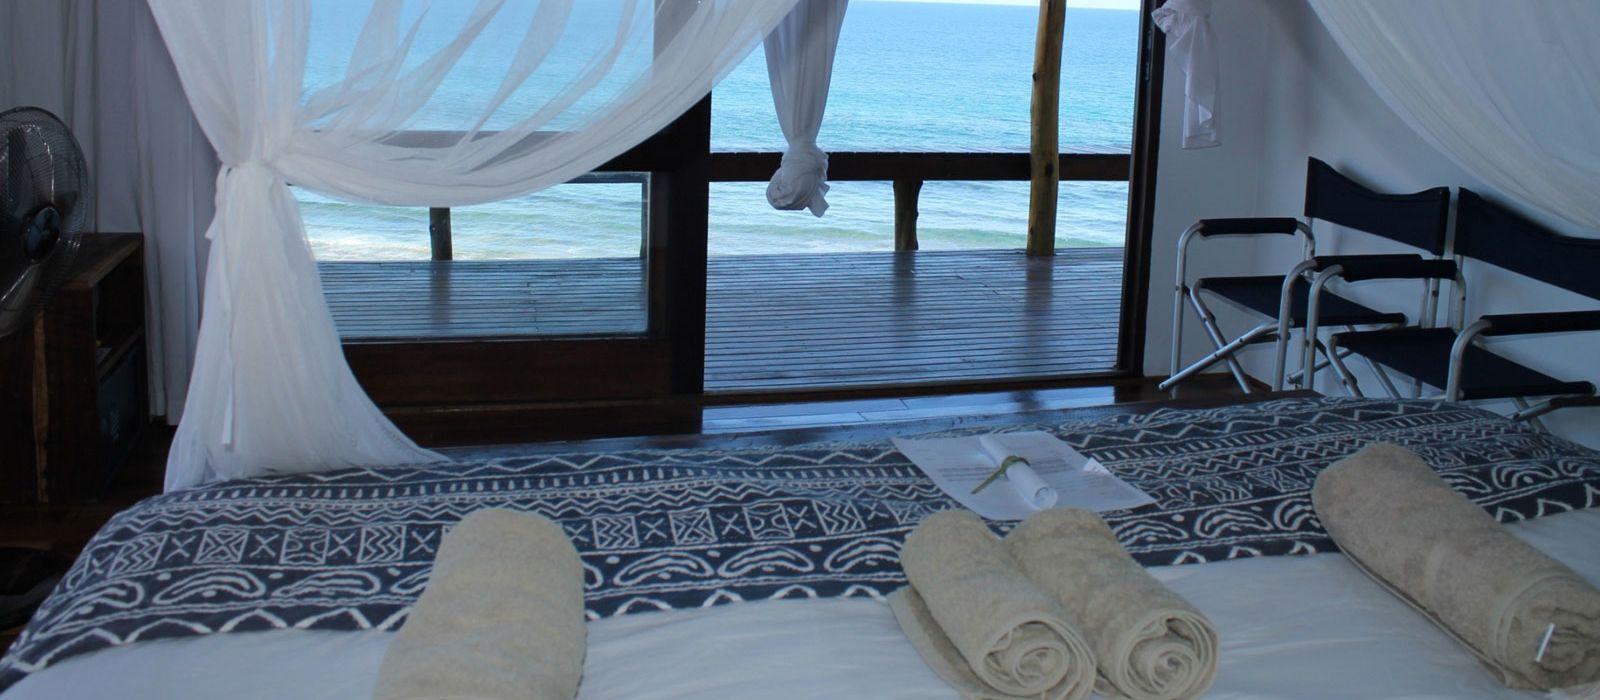 Hotel Blue Footprint Eco Lodge Mozambique